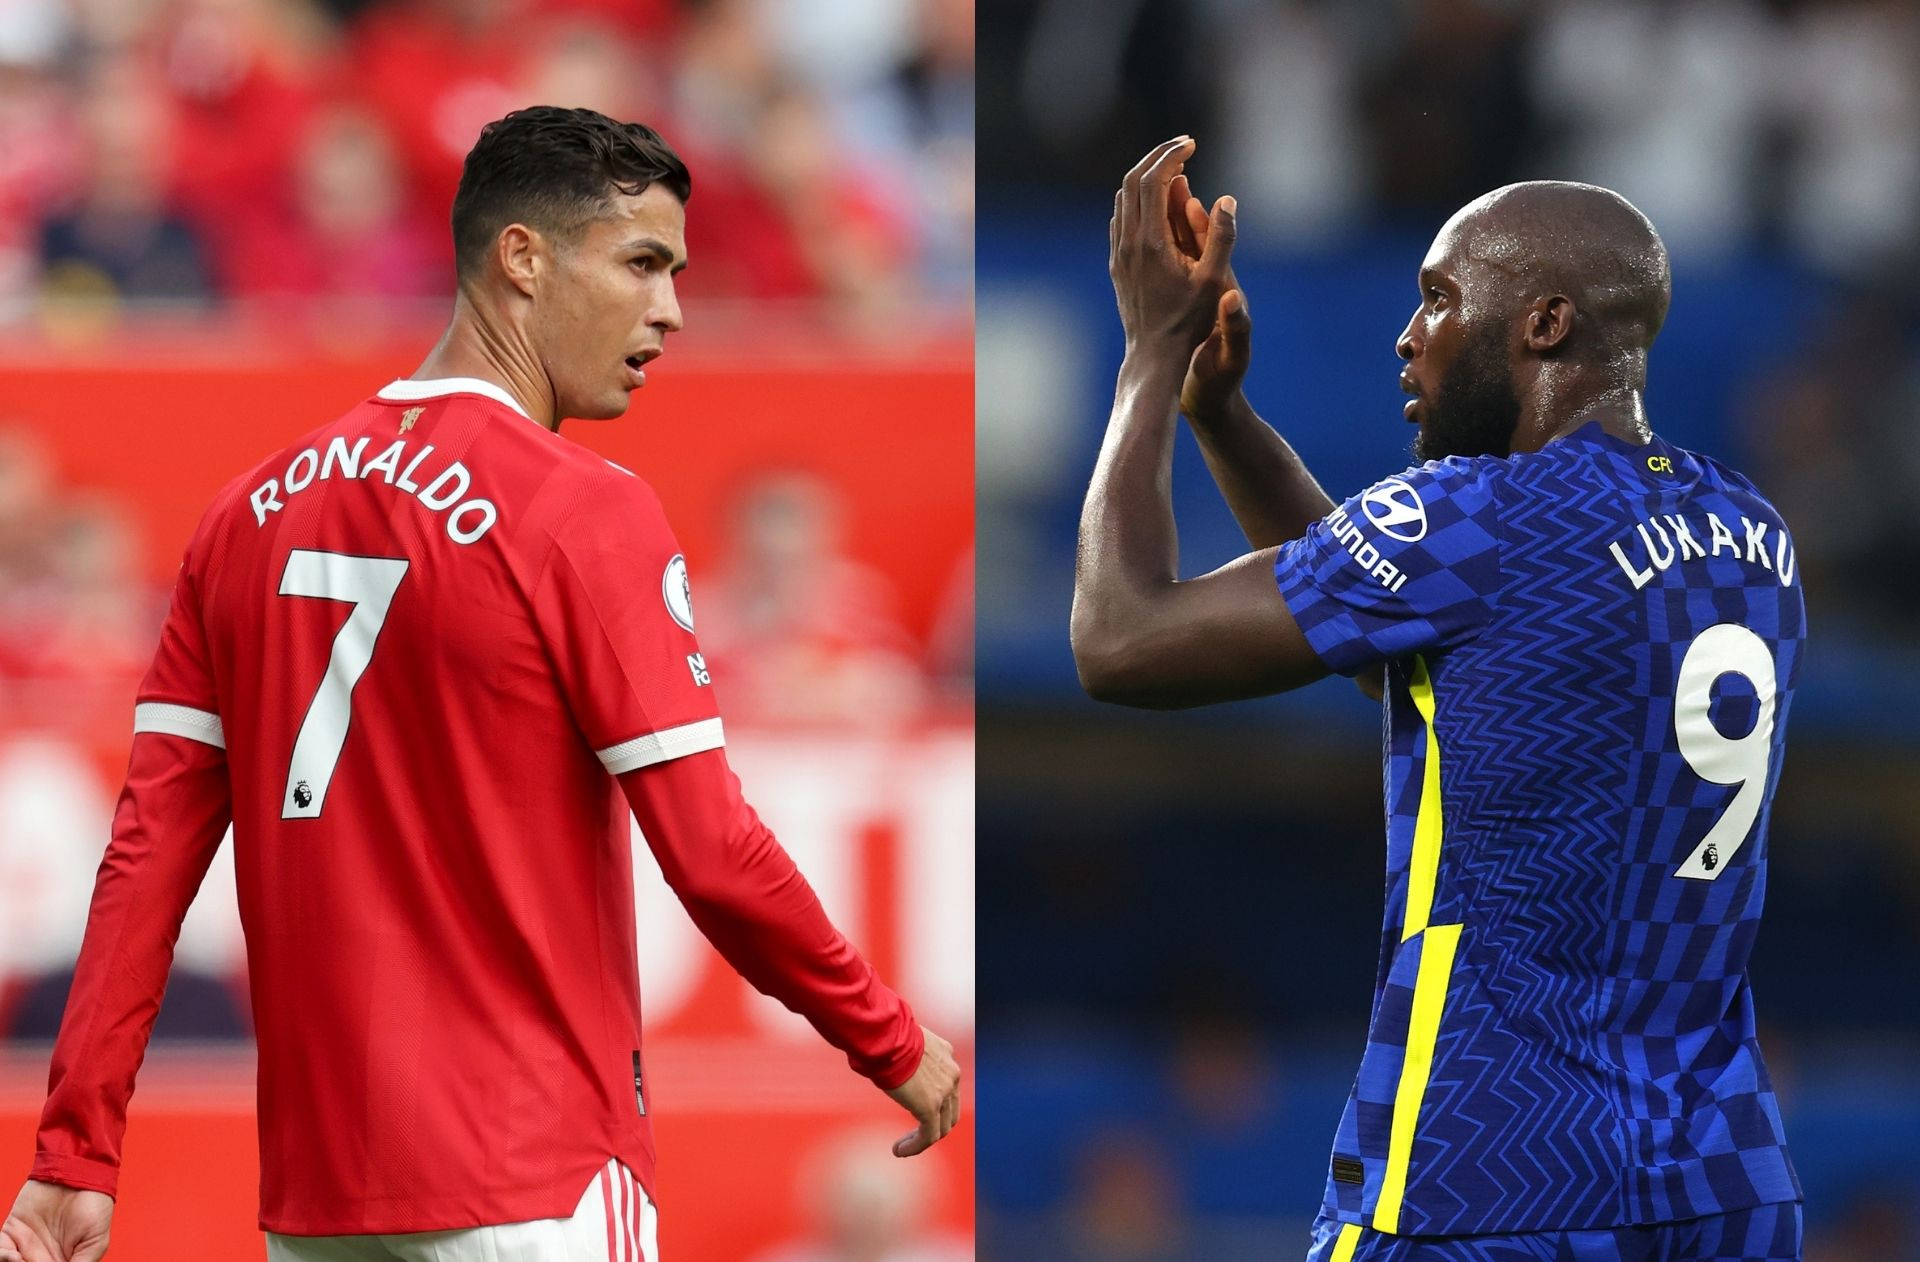 Premier League Top Scorers: Ronaldo & Lukaku ready for Round 2?